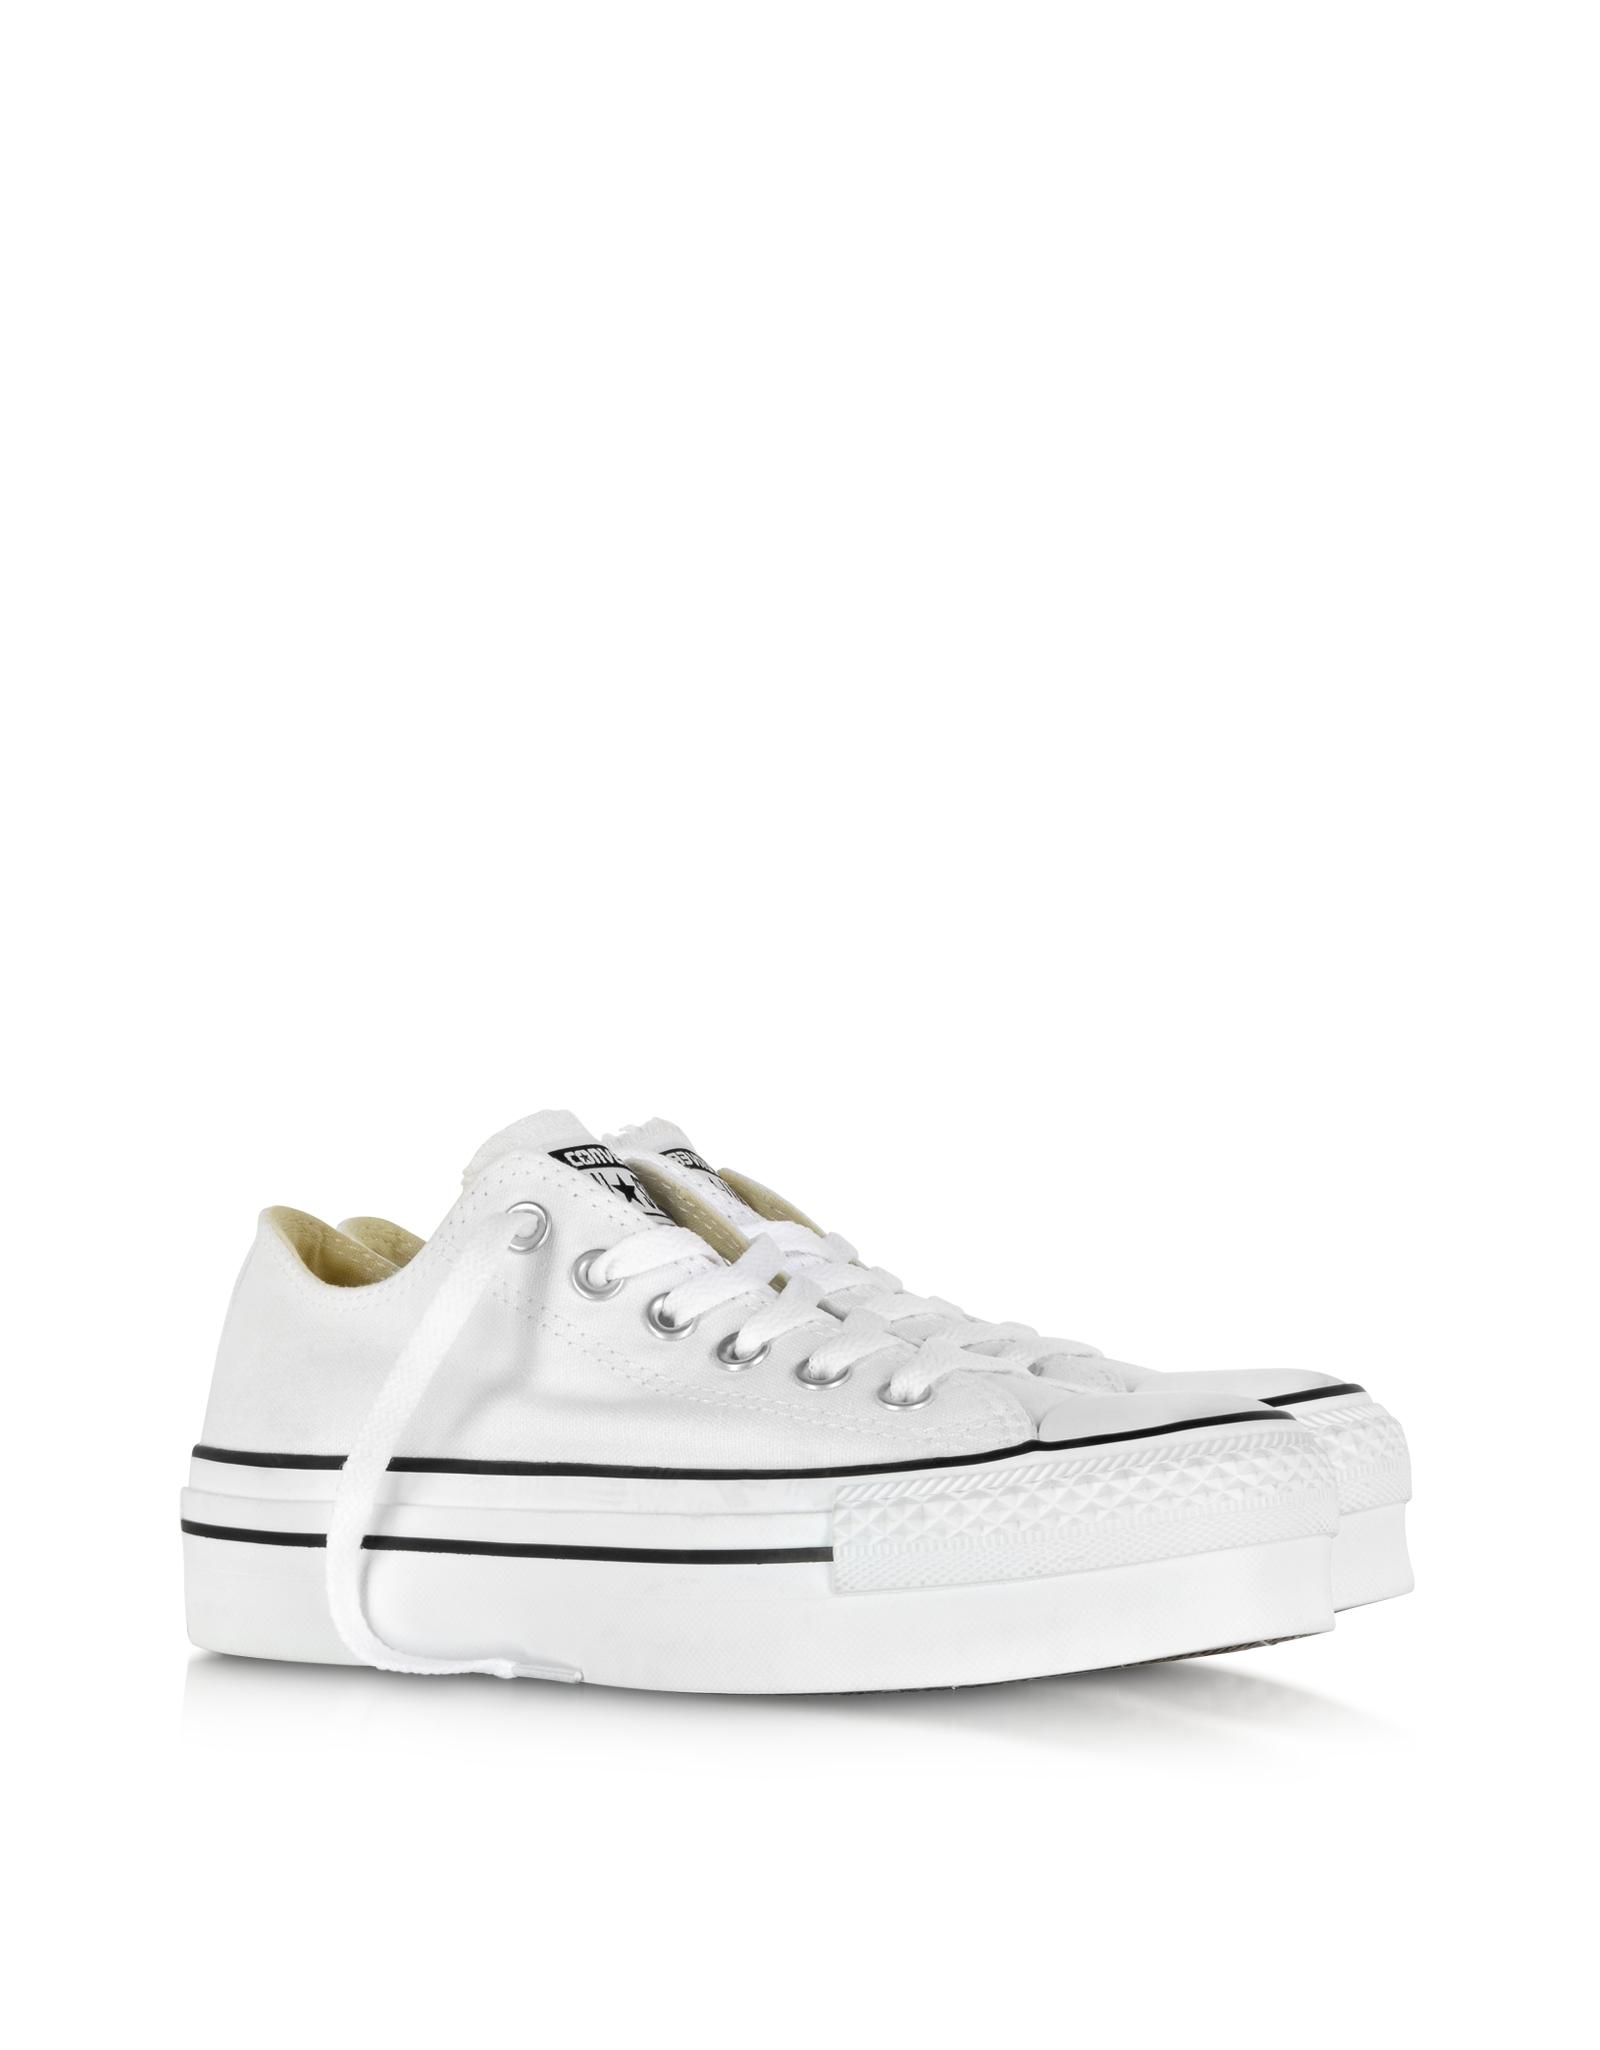 045f64b492929b Lyst - Converse All Star Ox White Canvas Platform Sneaker in White